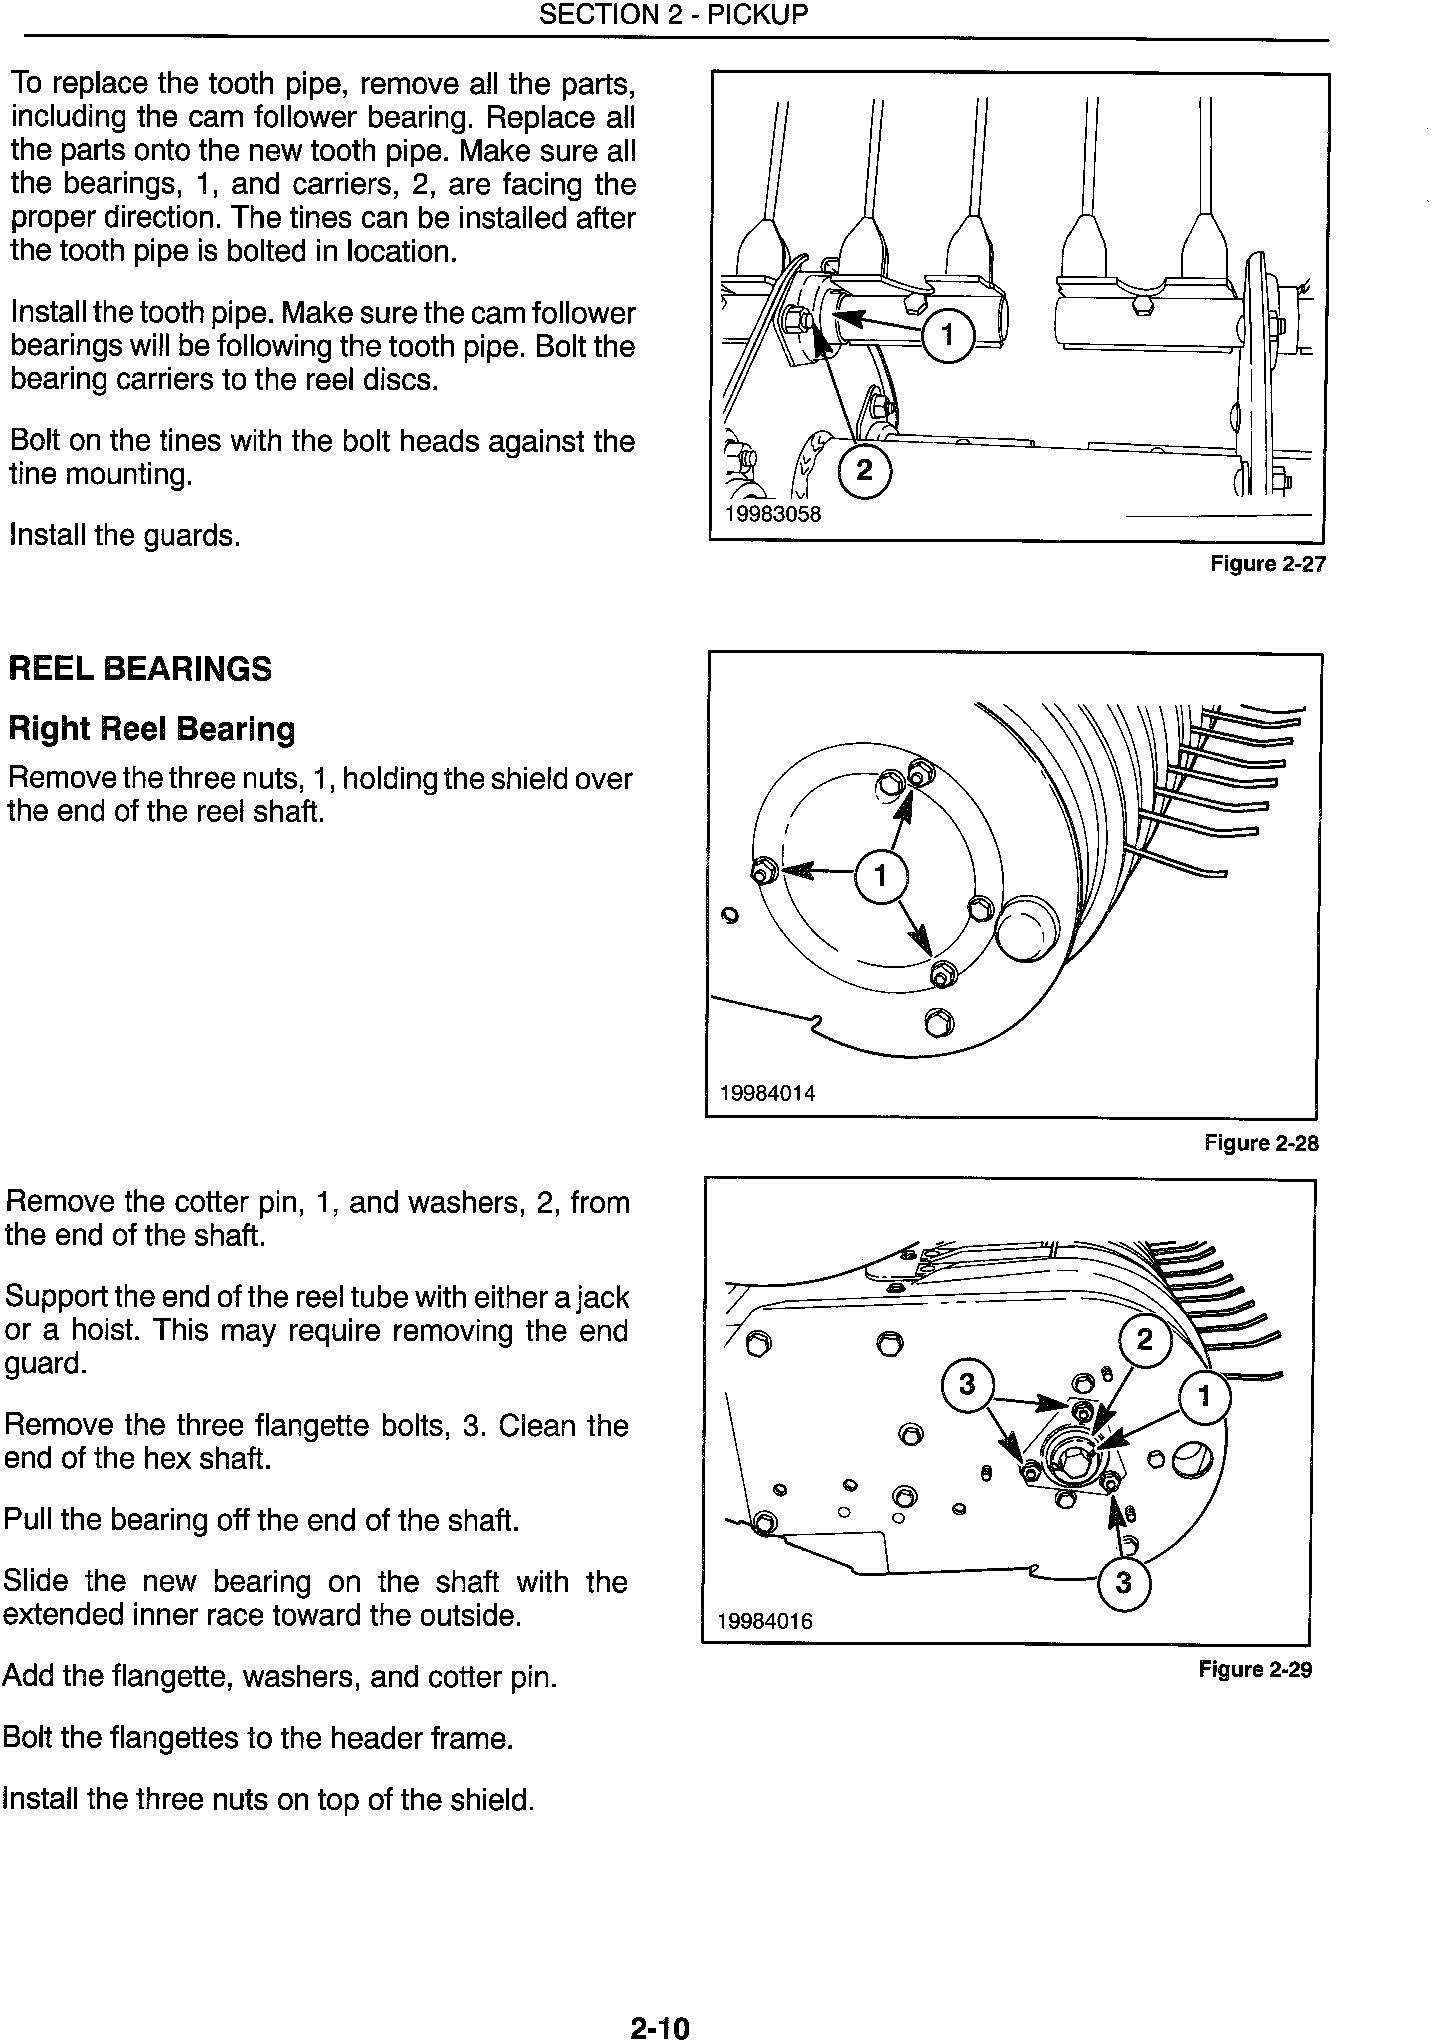 New Holland 345w, 355w, 365w Header Service Manual - 2